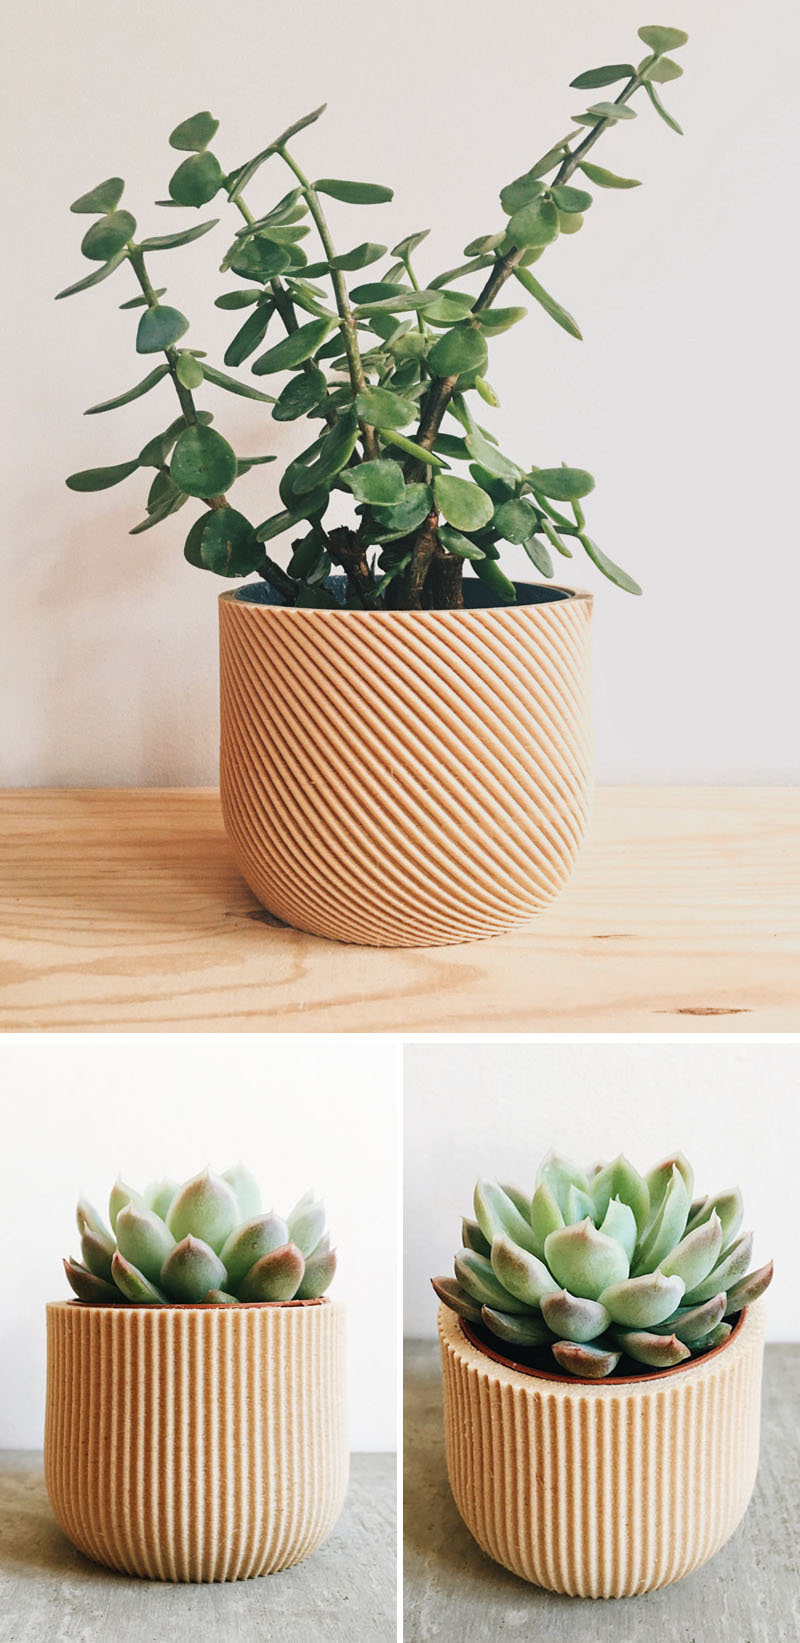 3d-printed-modern-wood-planters-080317-1113-05